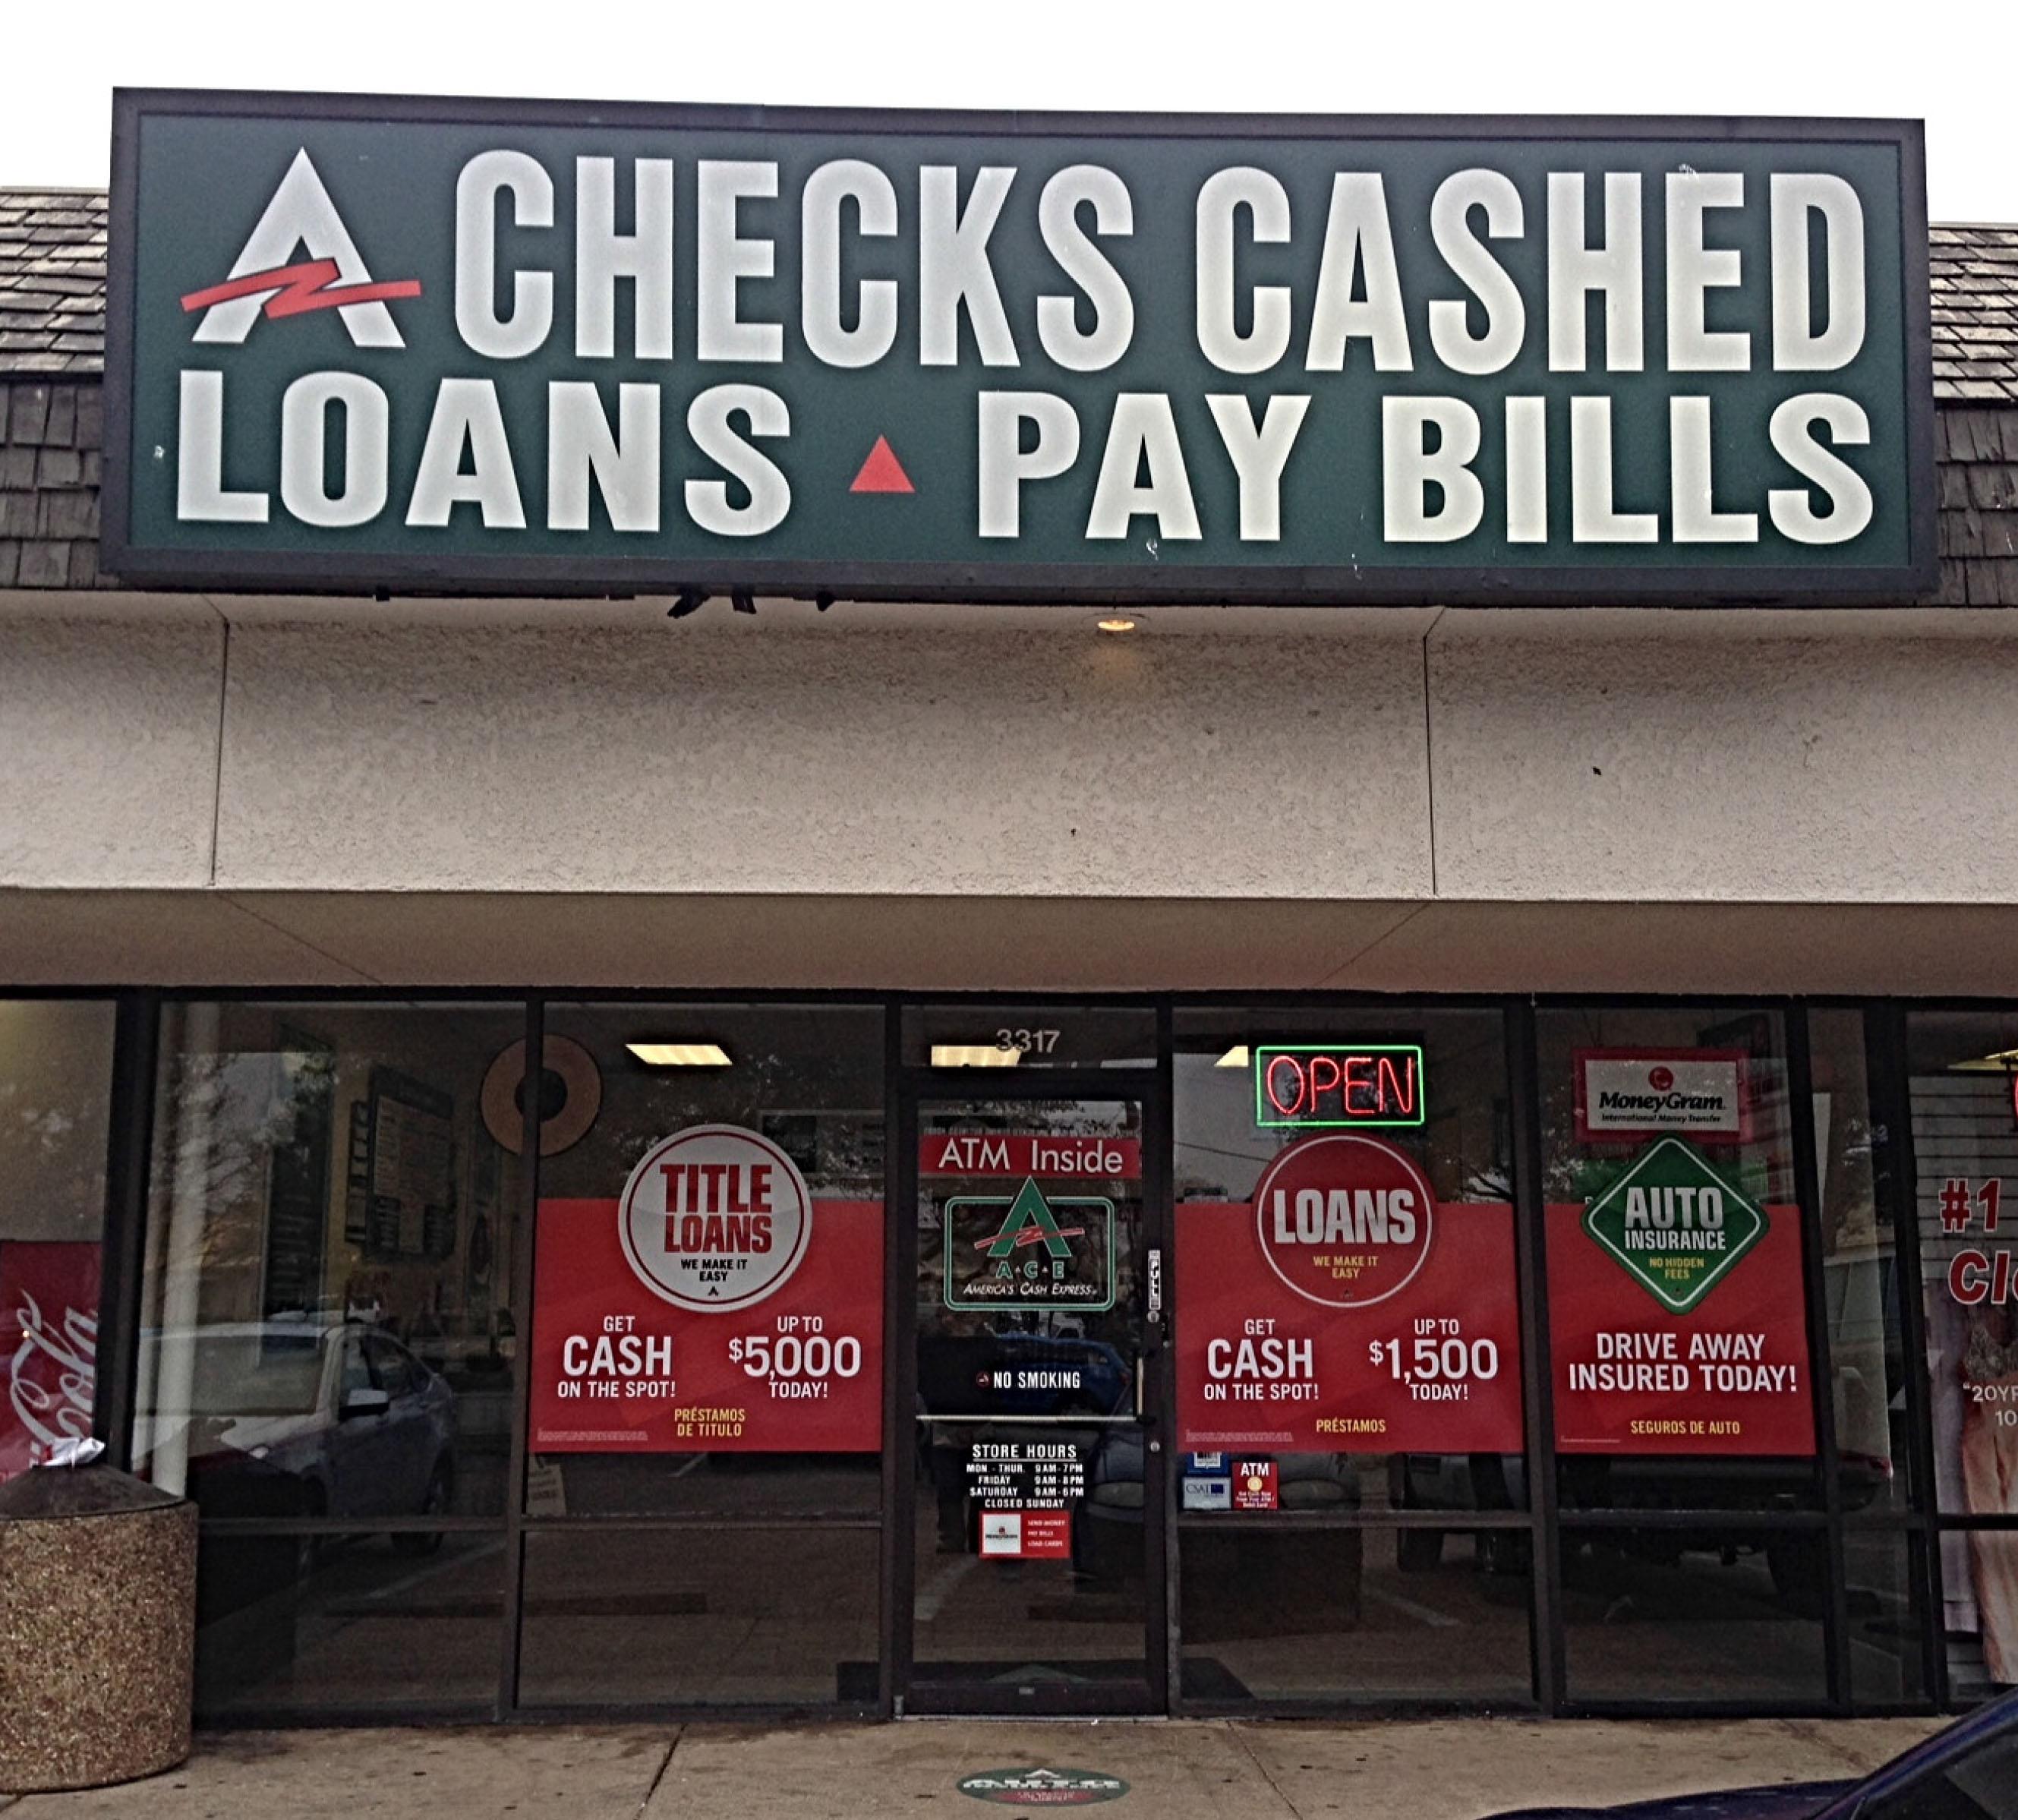 Shoprite money market loans image 2